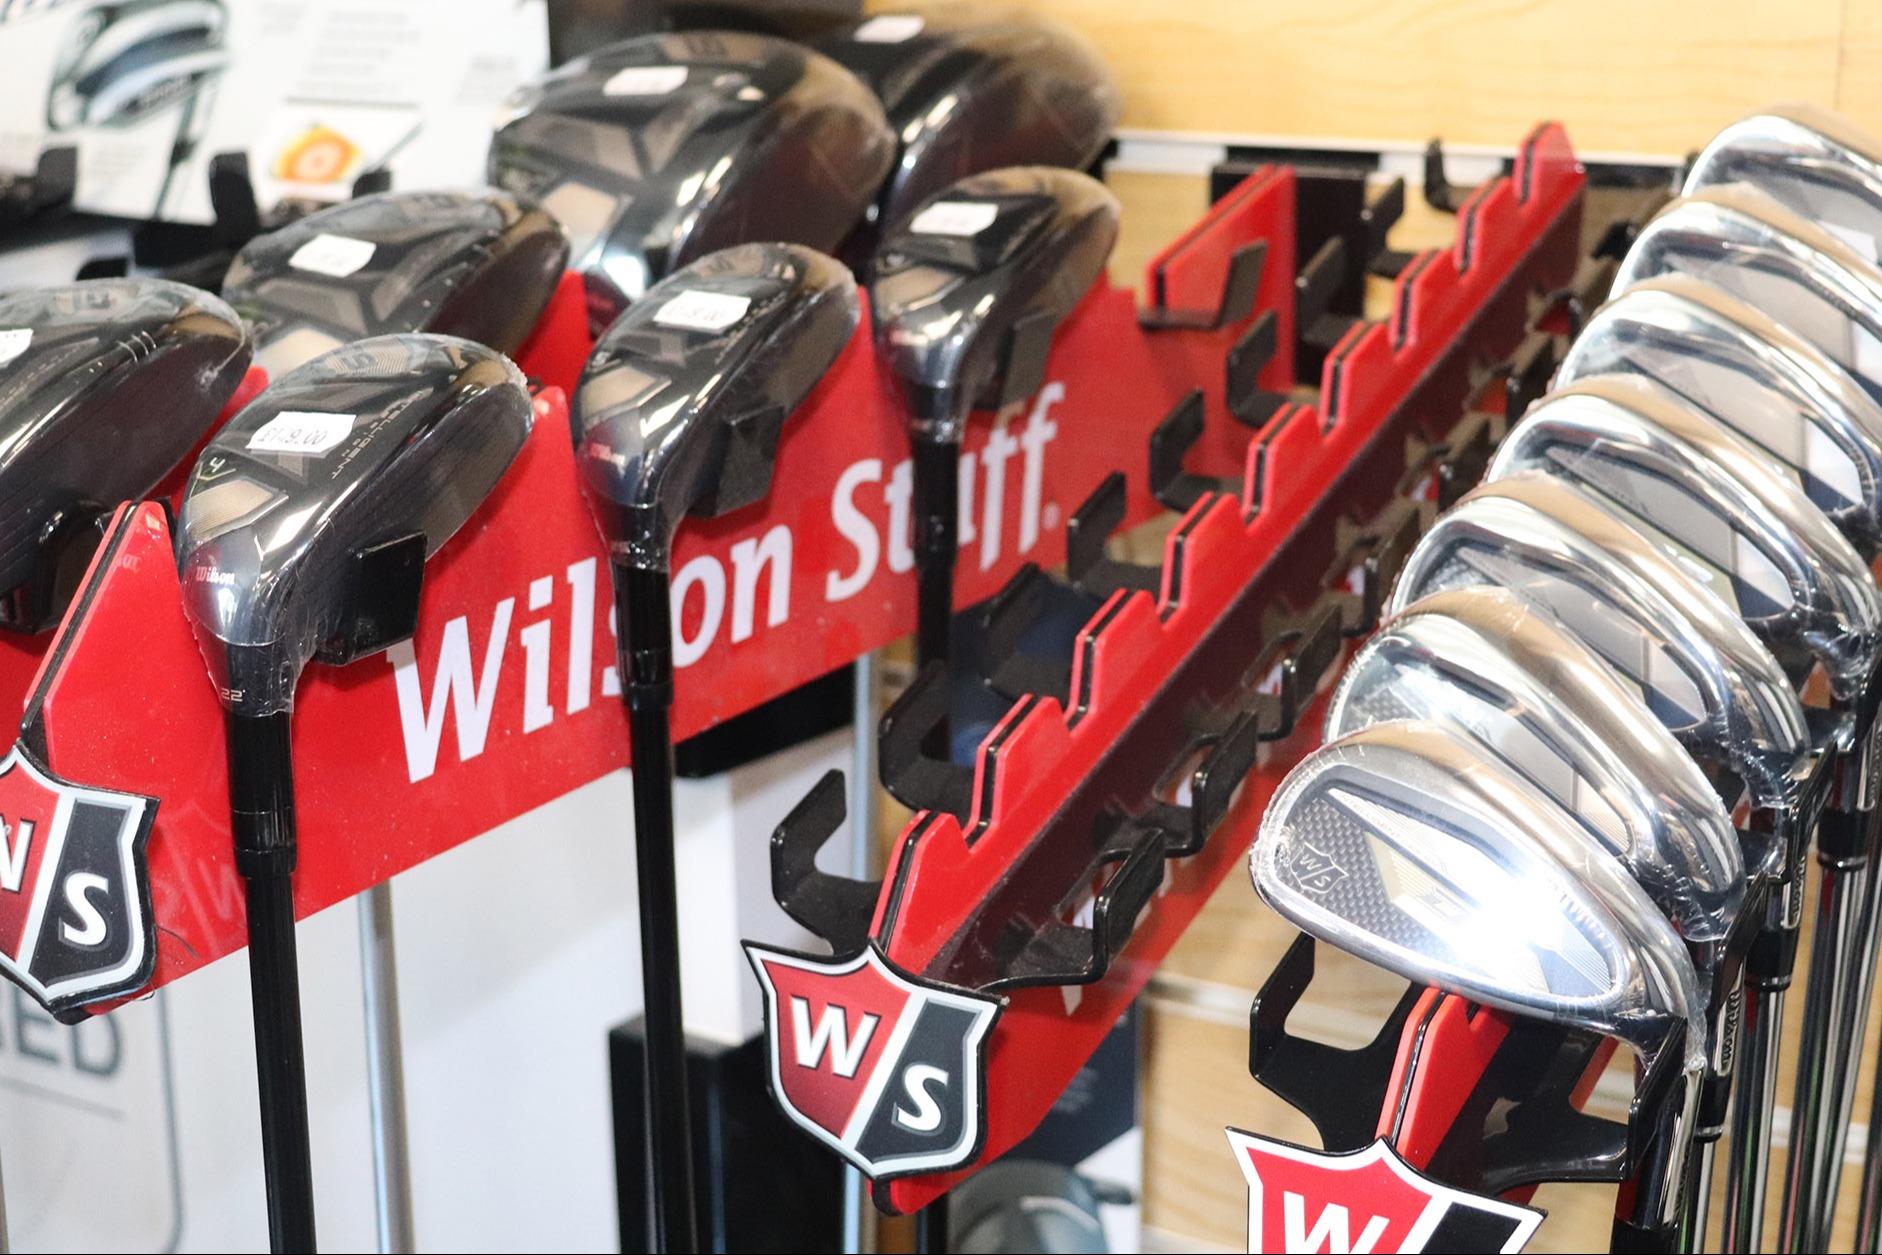 Wilson Staff - Woods, hybrids and irons